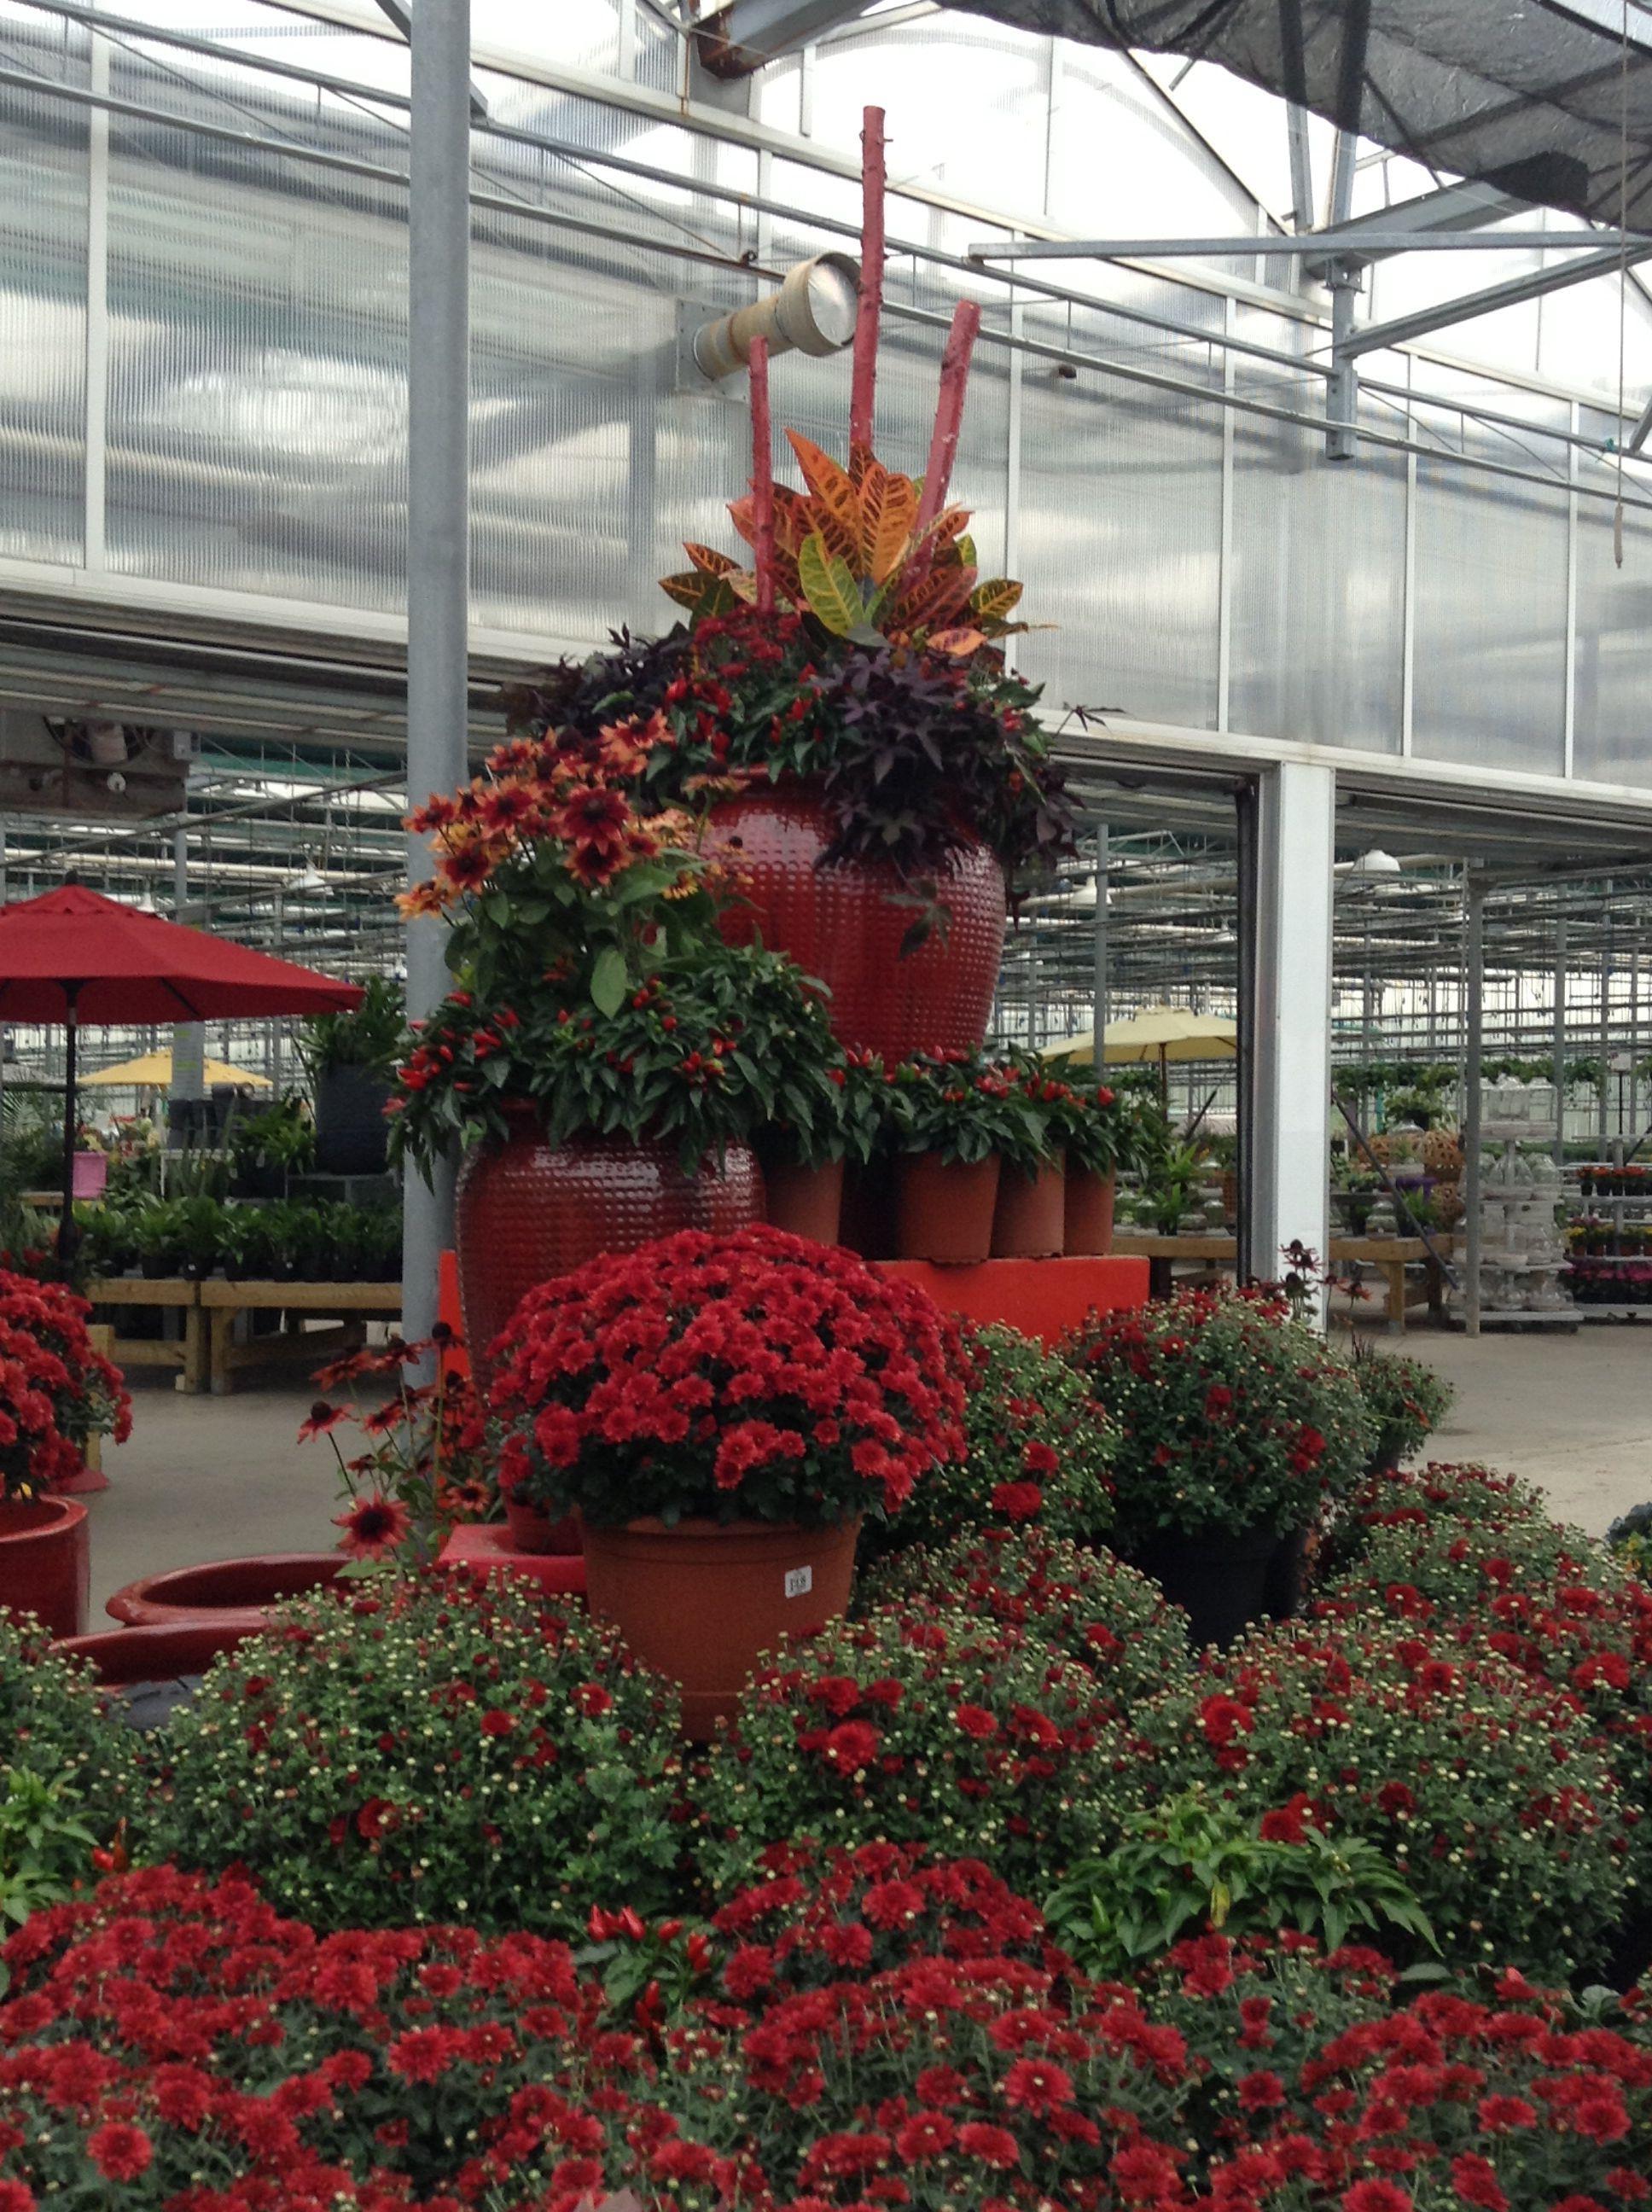 Hot Red Planters Growing herbs indoors, Plant nursery